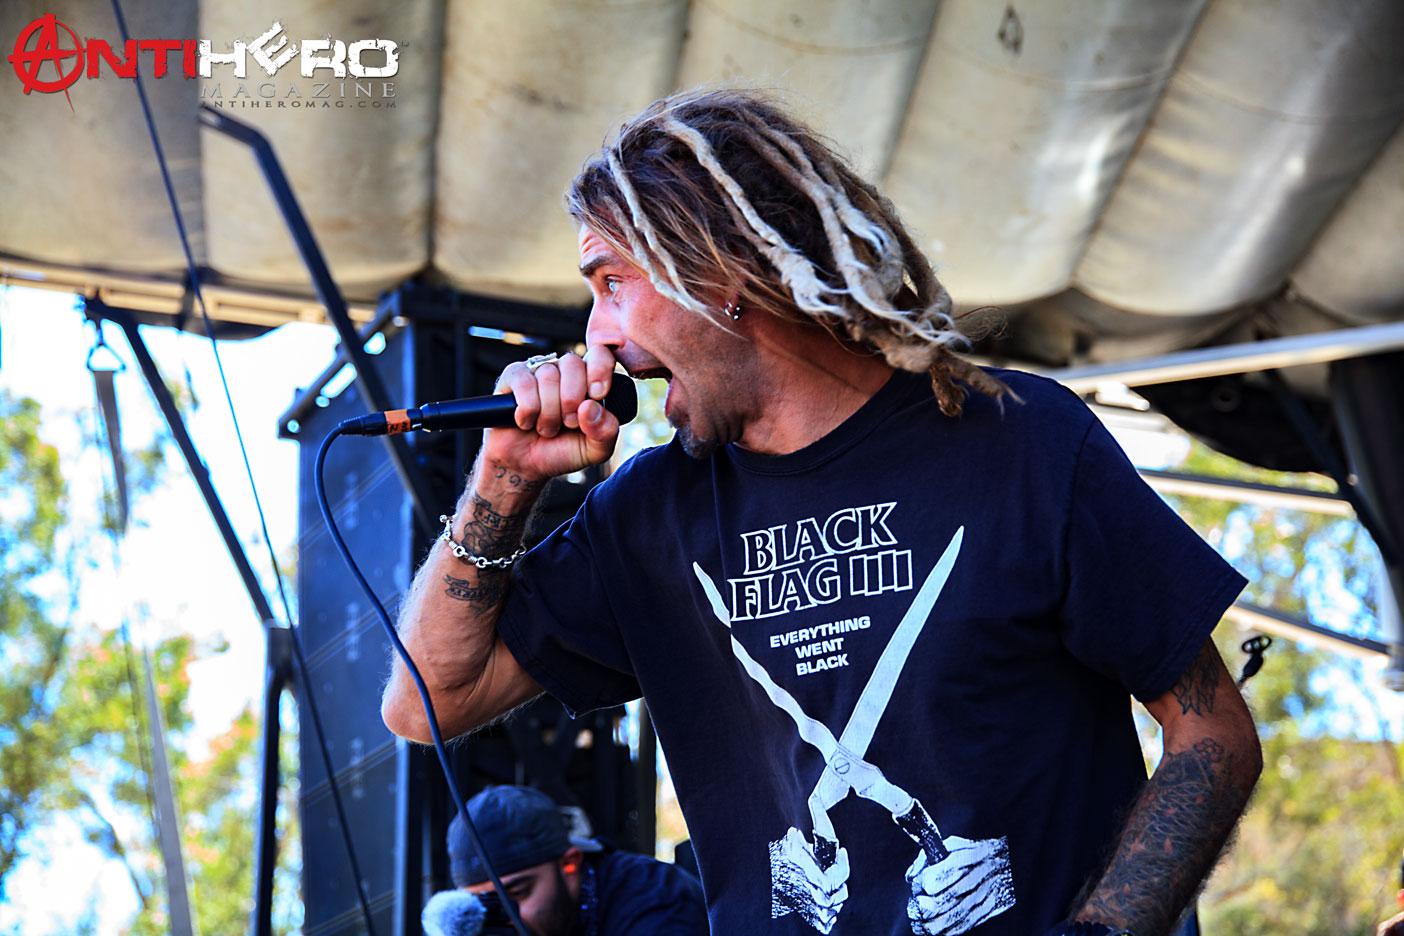 Ozzfest-Knotfest-2016_160925_1178